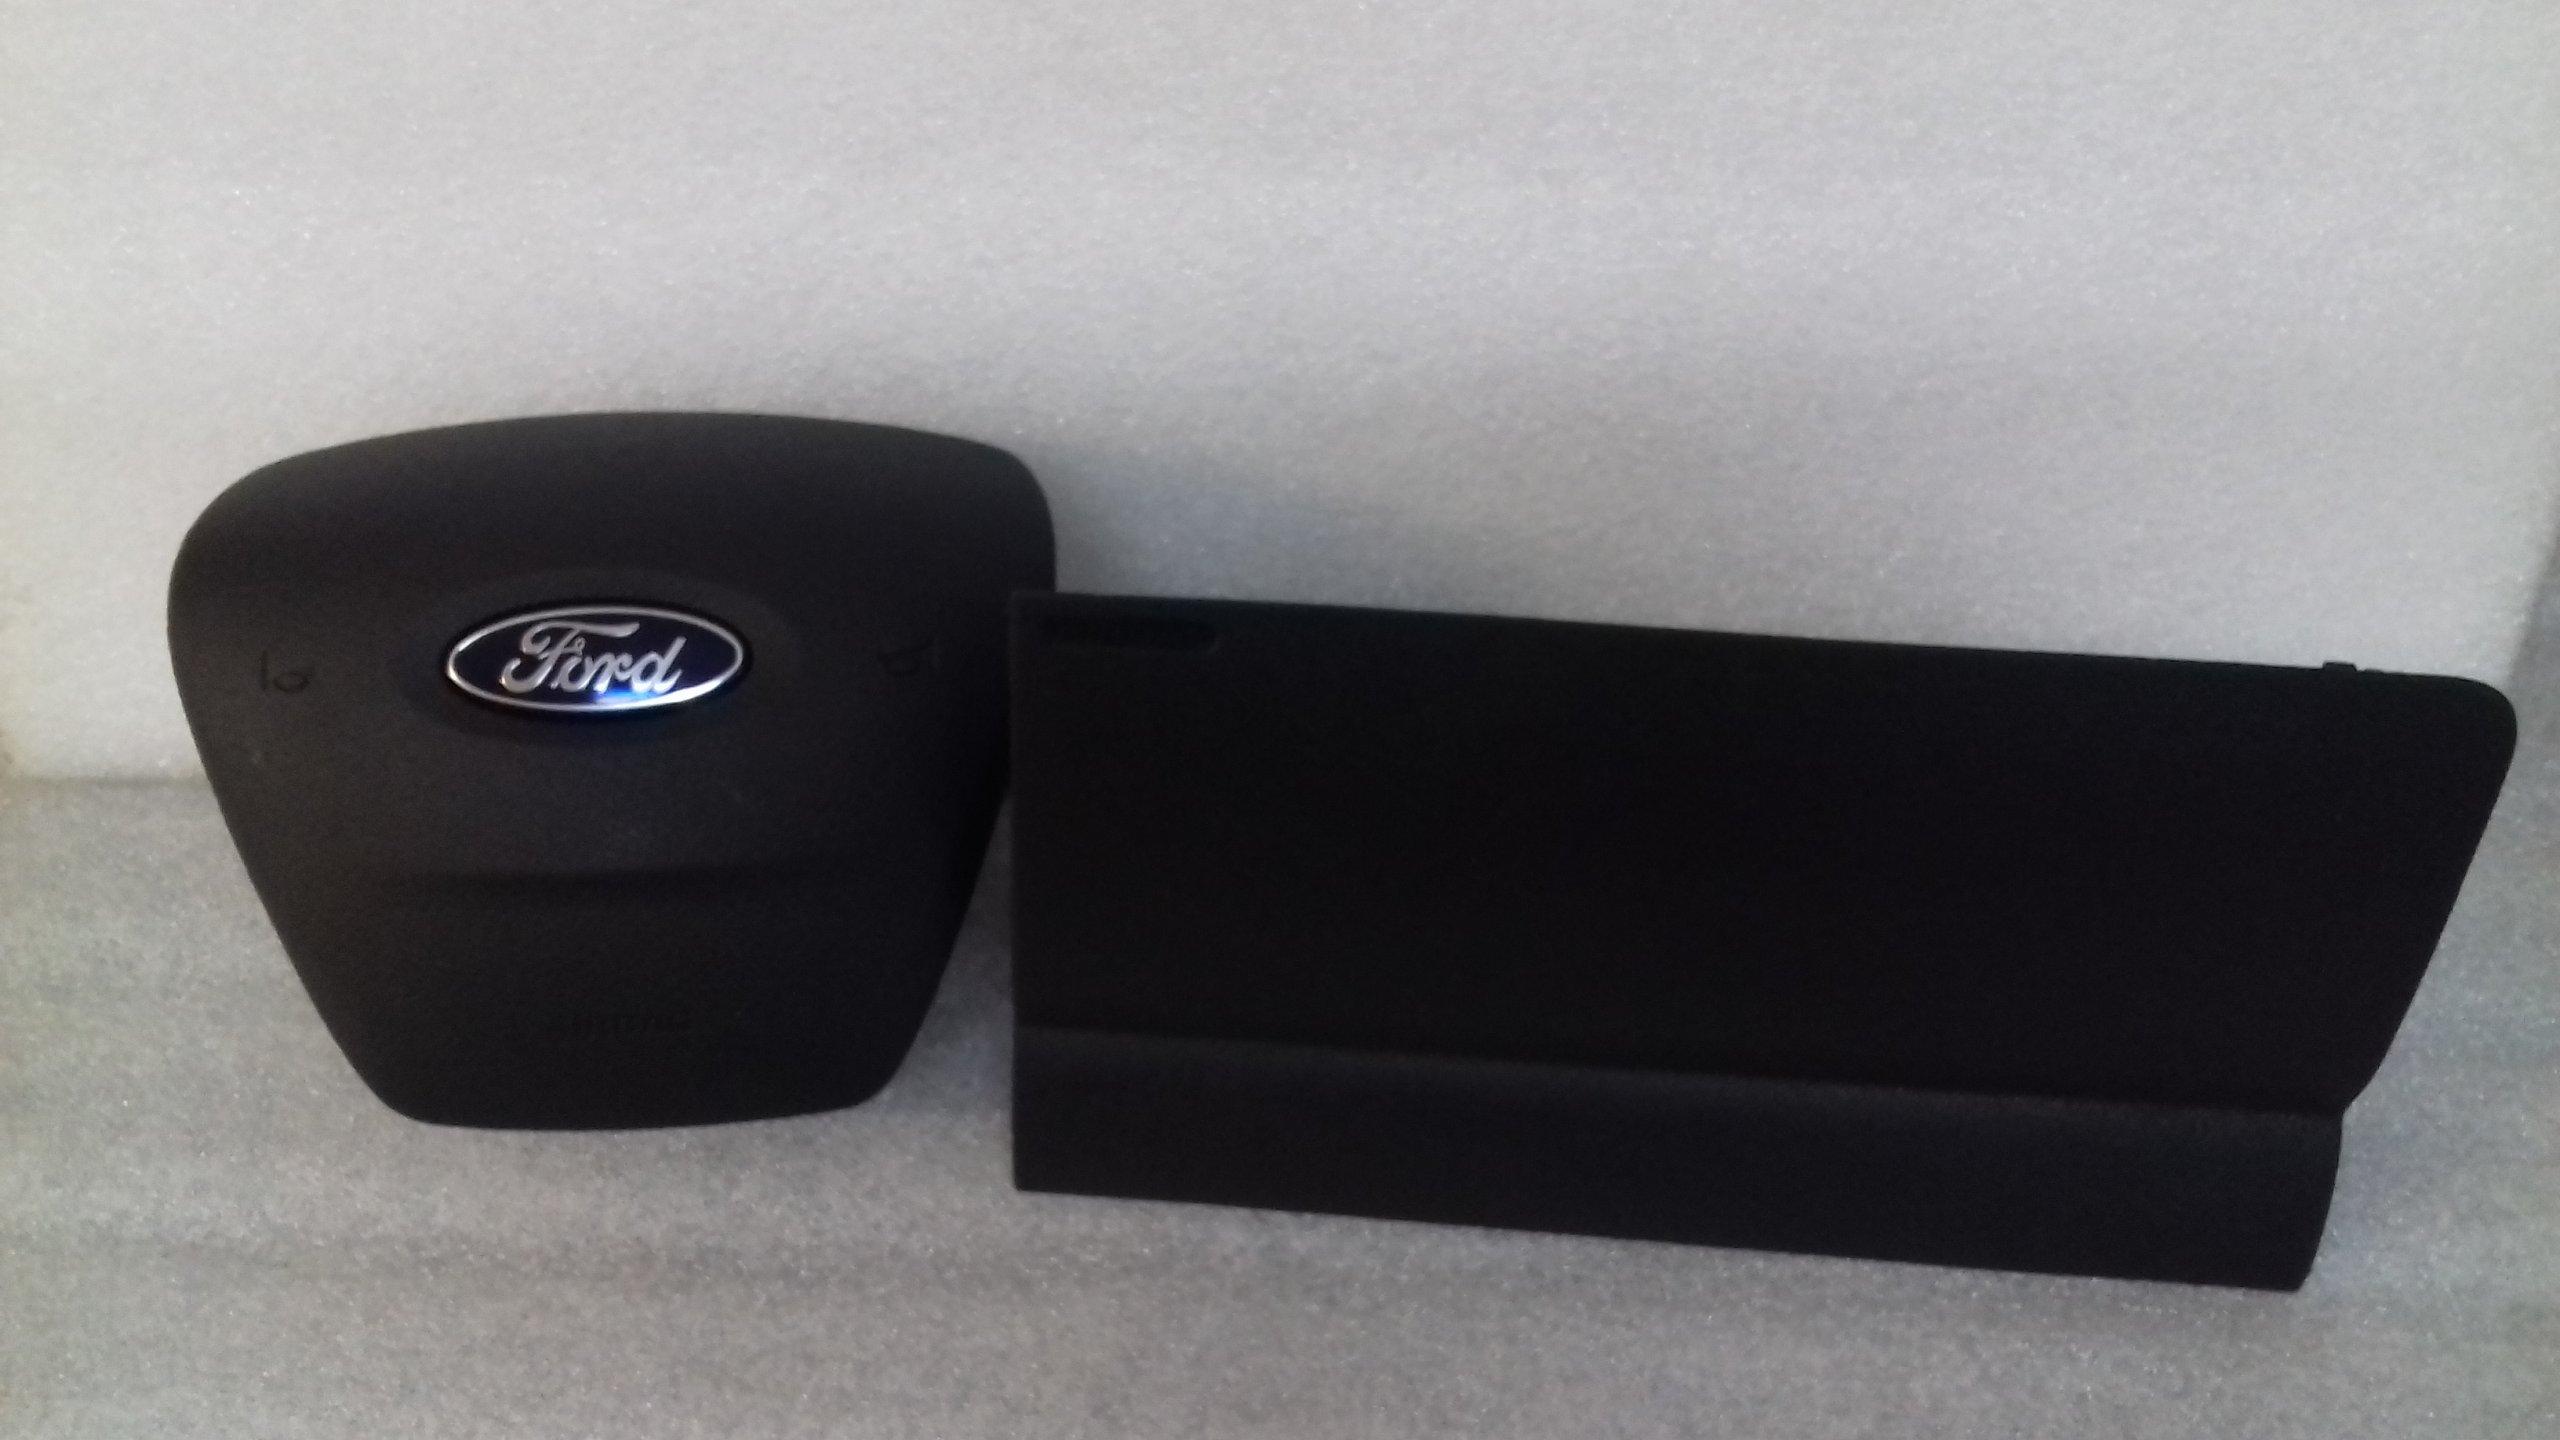 Airbag Poduszka Poduszki Ford Kuga Usa 7252970100